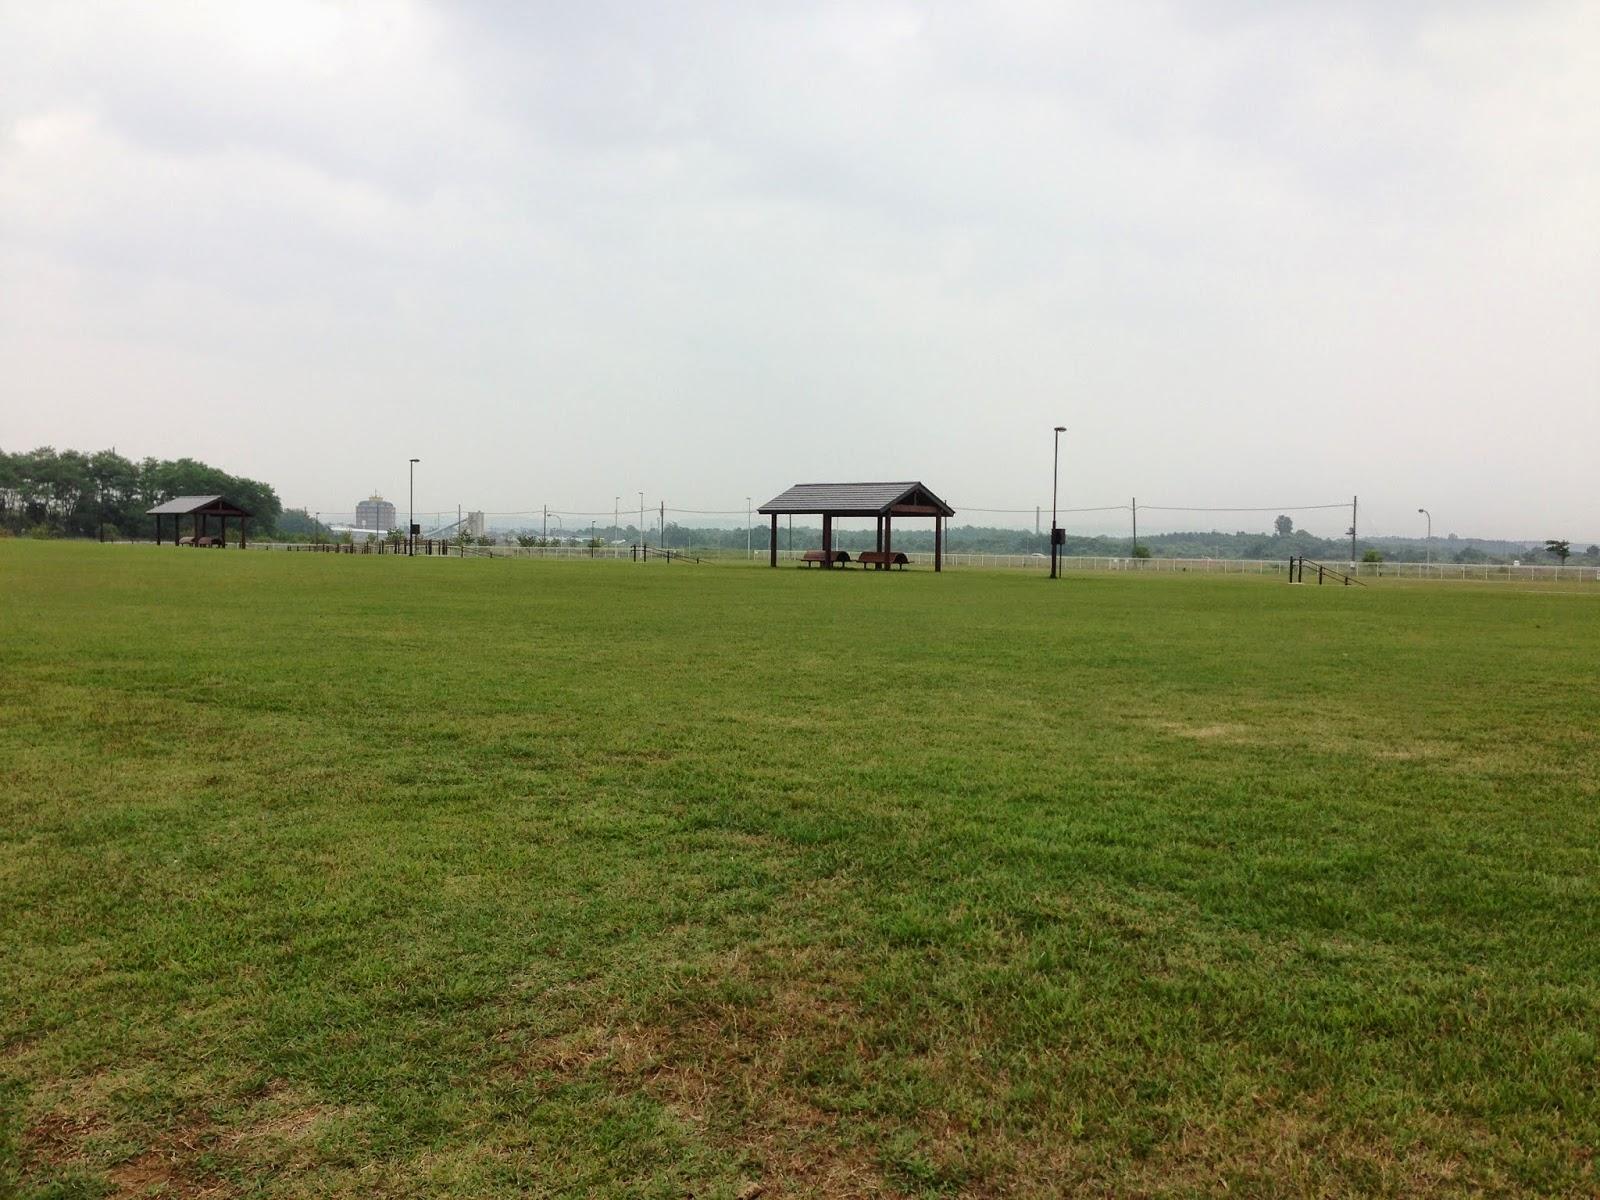 aomori sports complex, biking in aomori